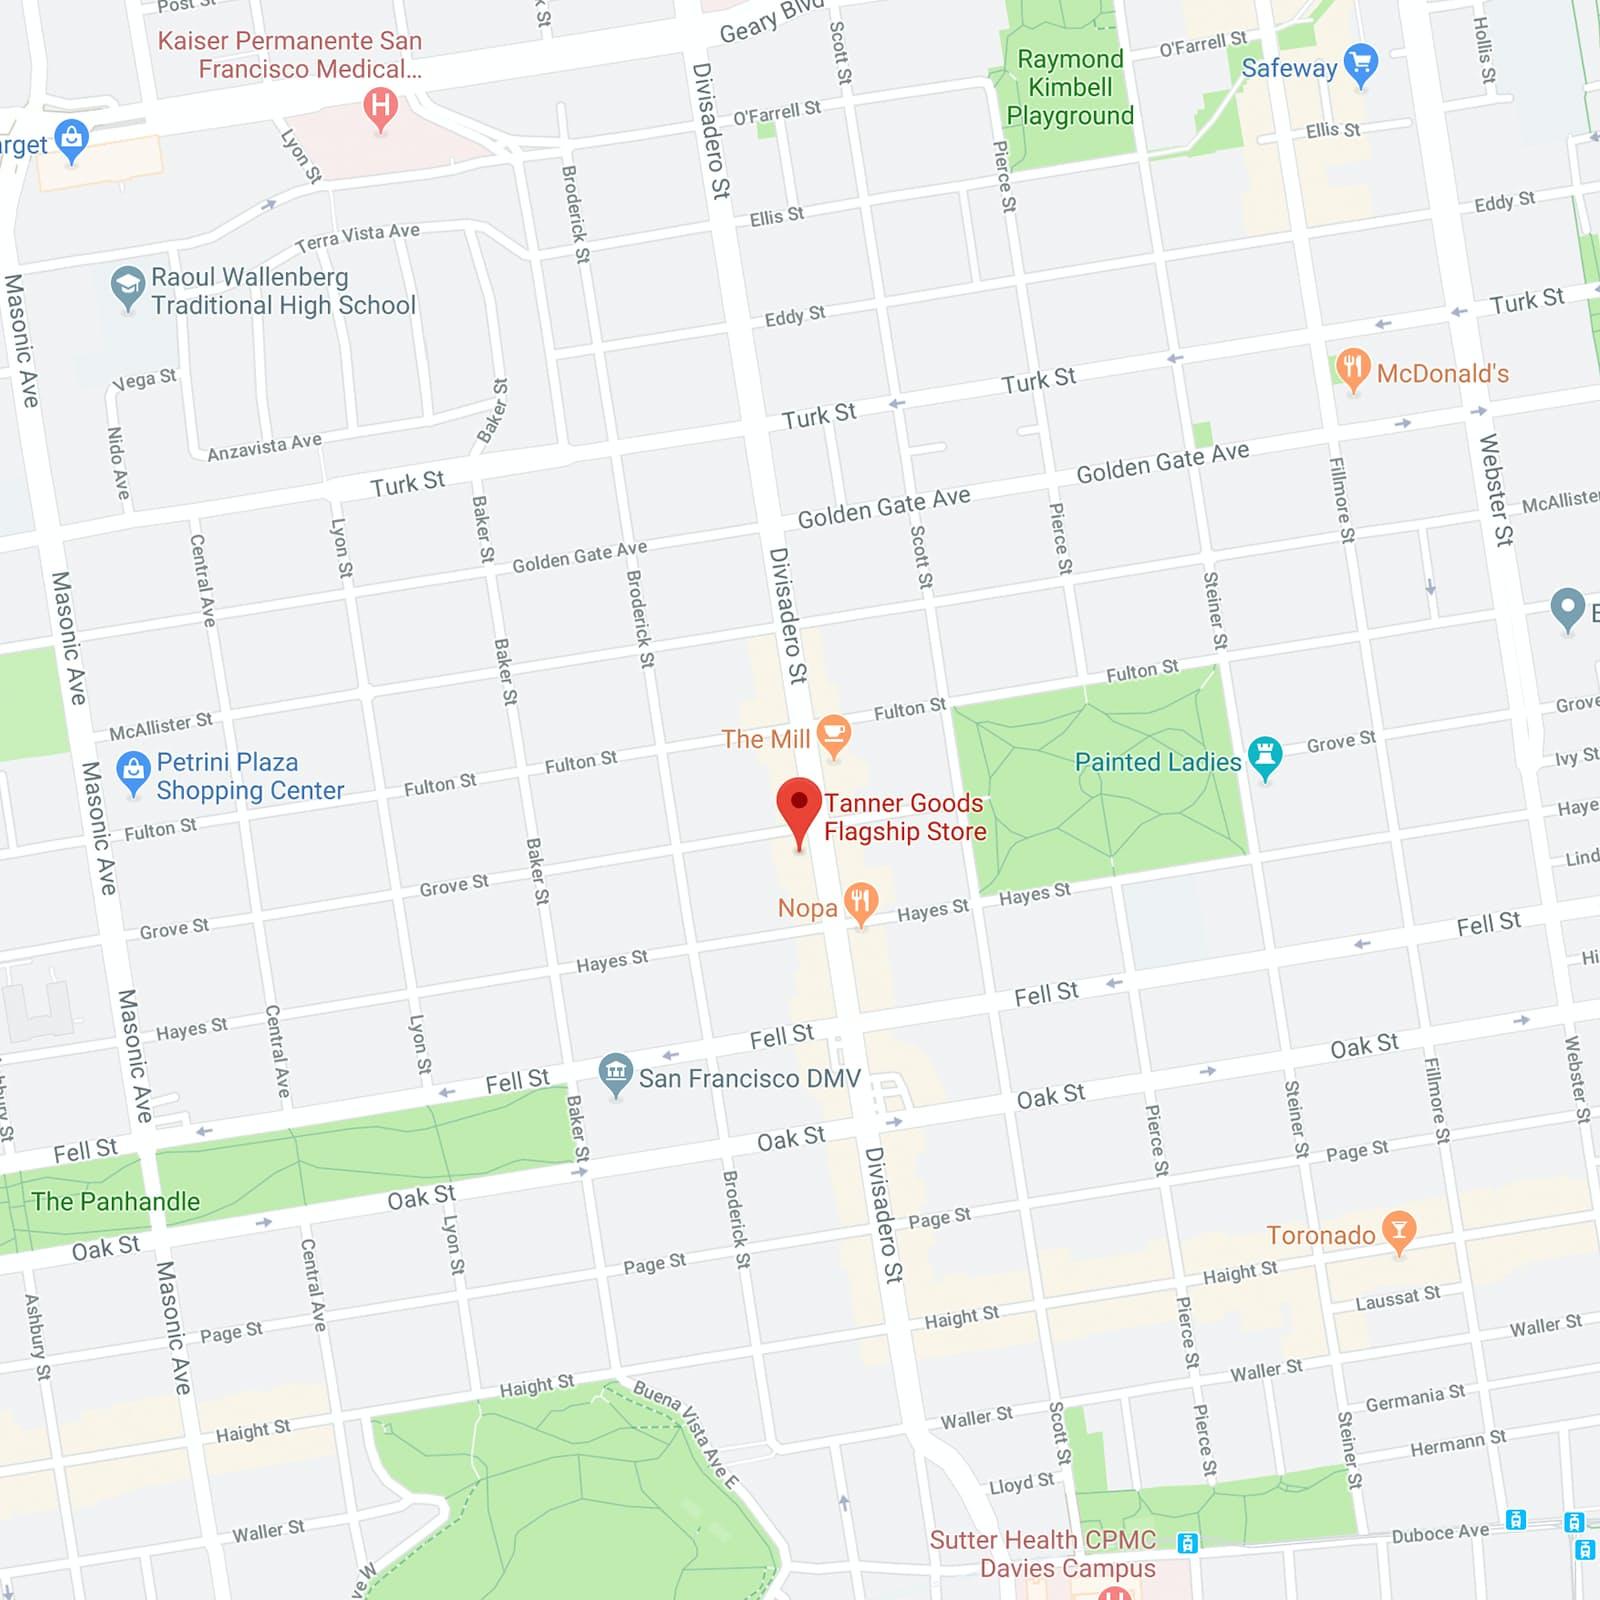 Google maps screenshot cropped v2.jpg?ixlib=rails 2.1